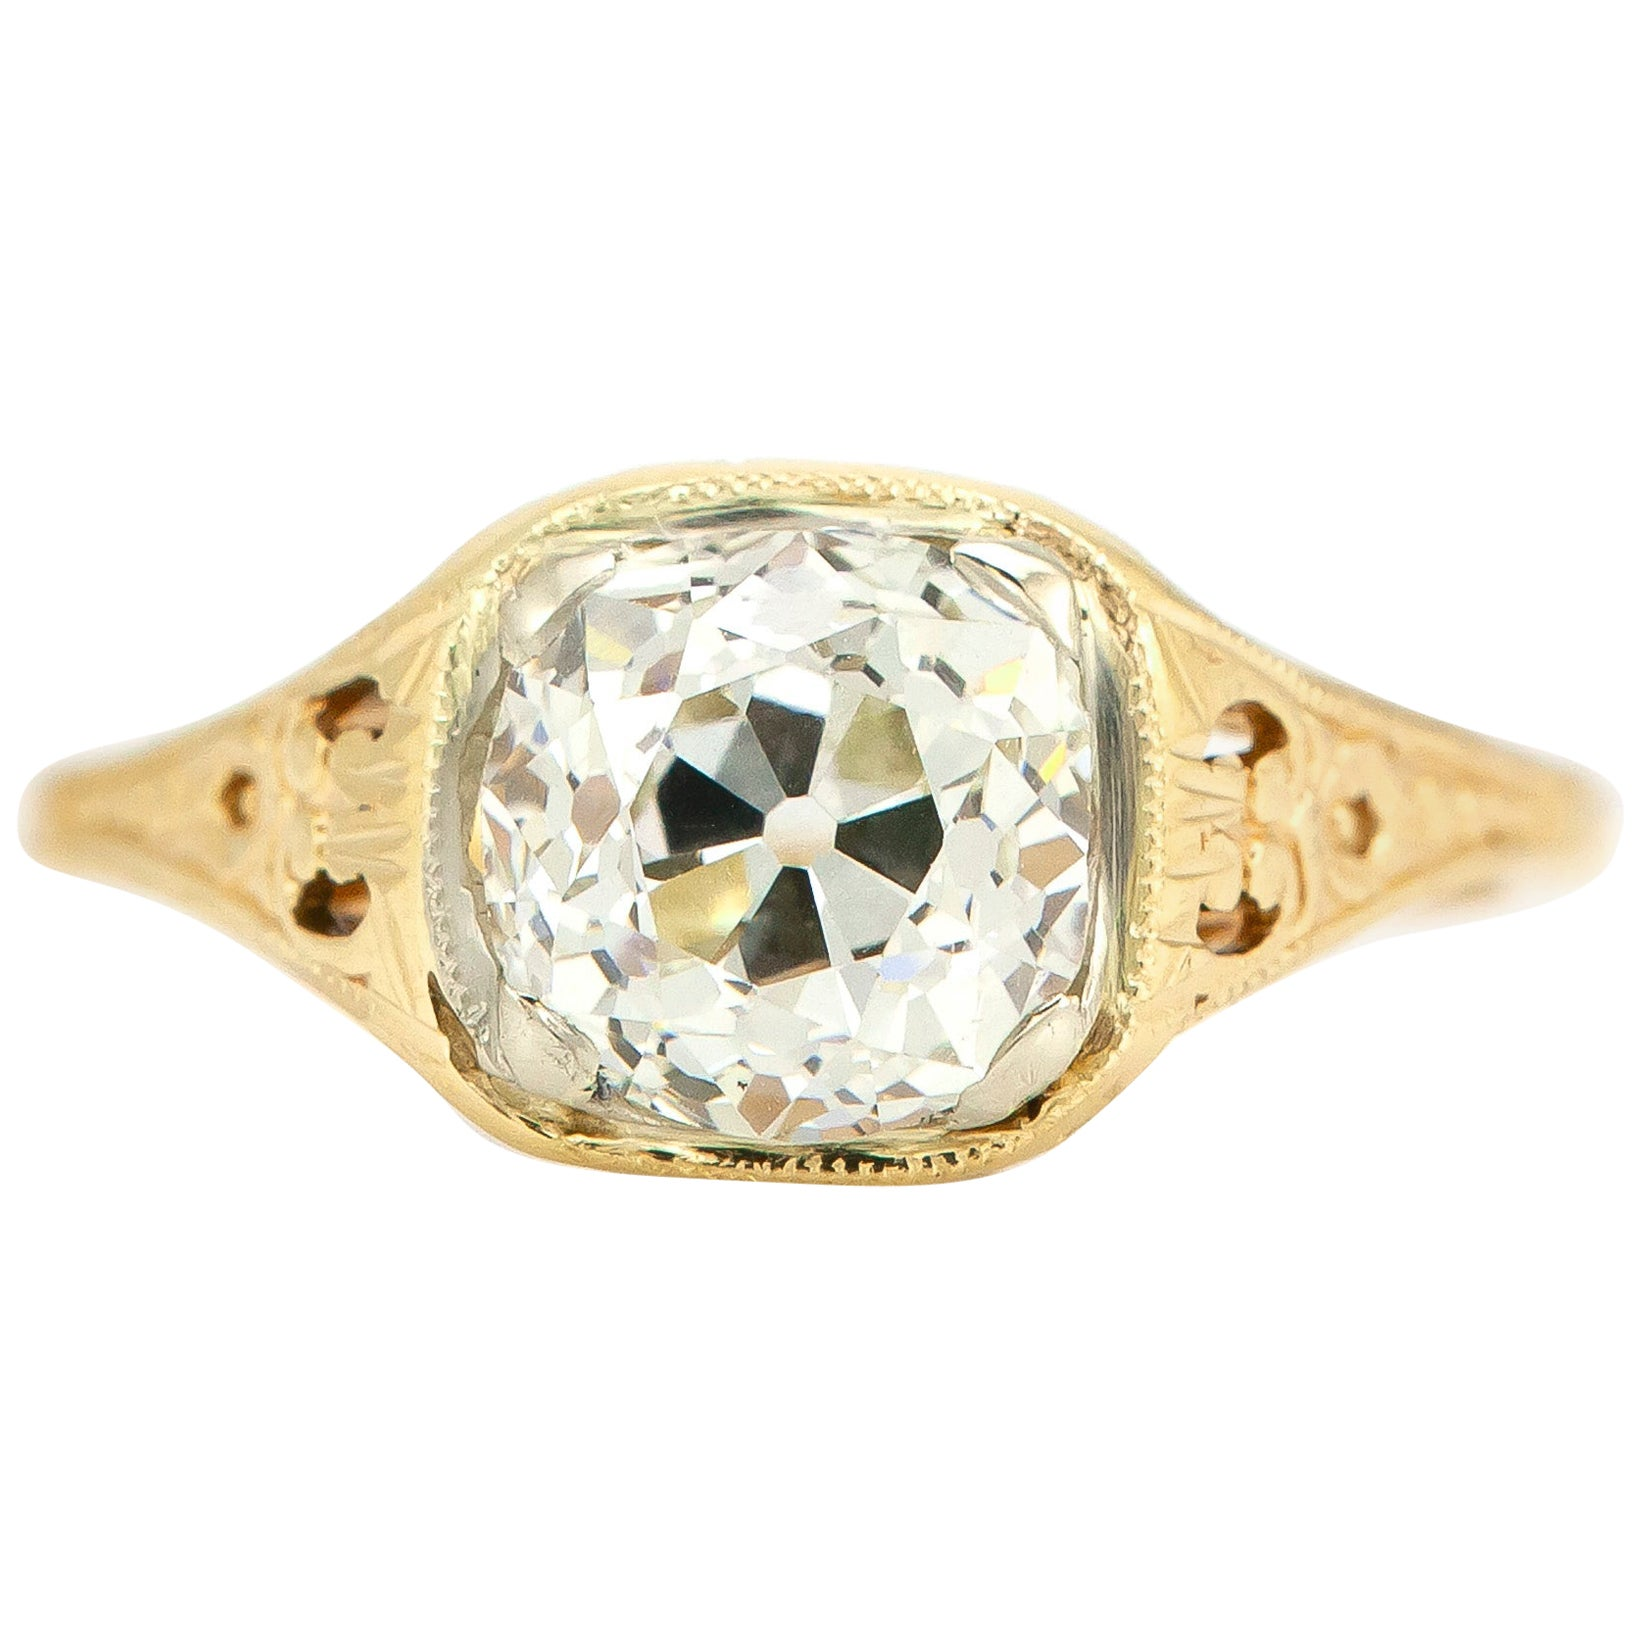 Art Deco 1.56 Carat Old Mine Cushion Diamond Engagement Ring